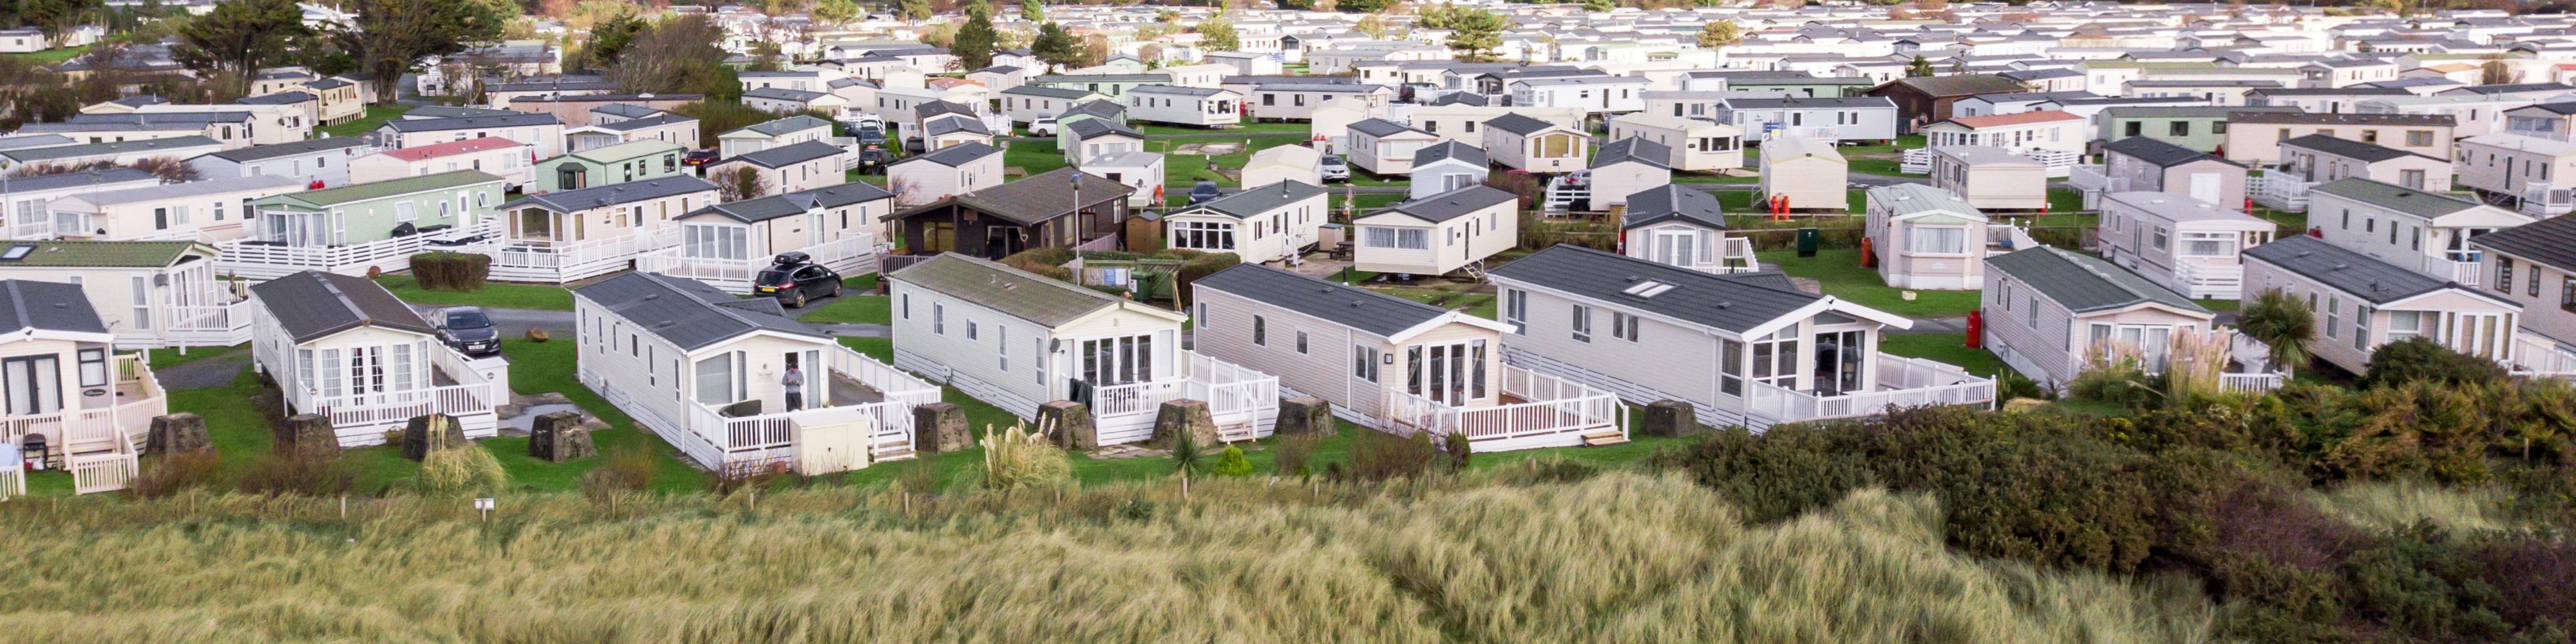 Park Homes Advice By Lease Linkedin